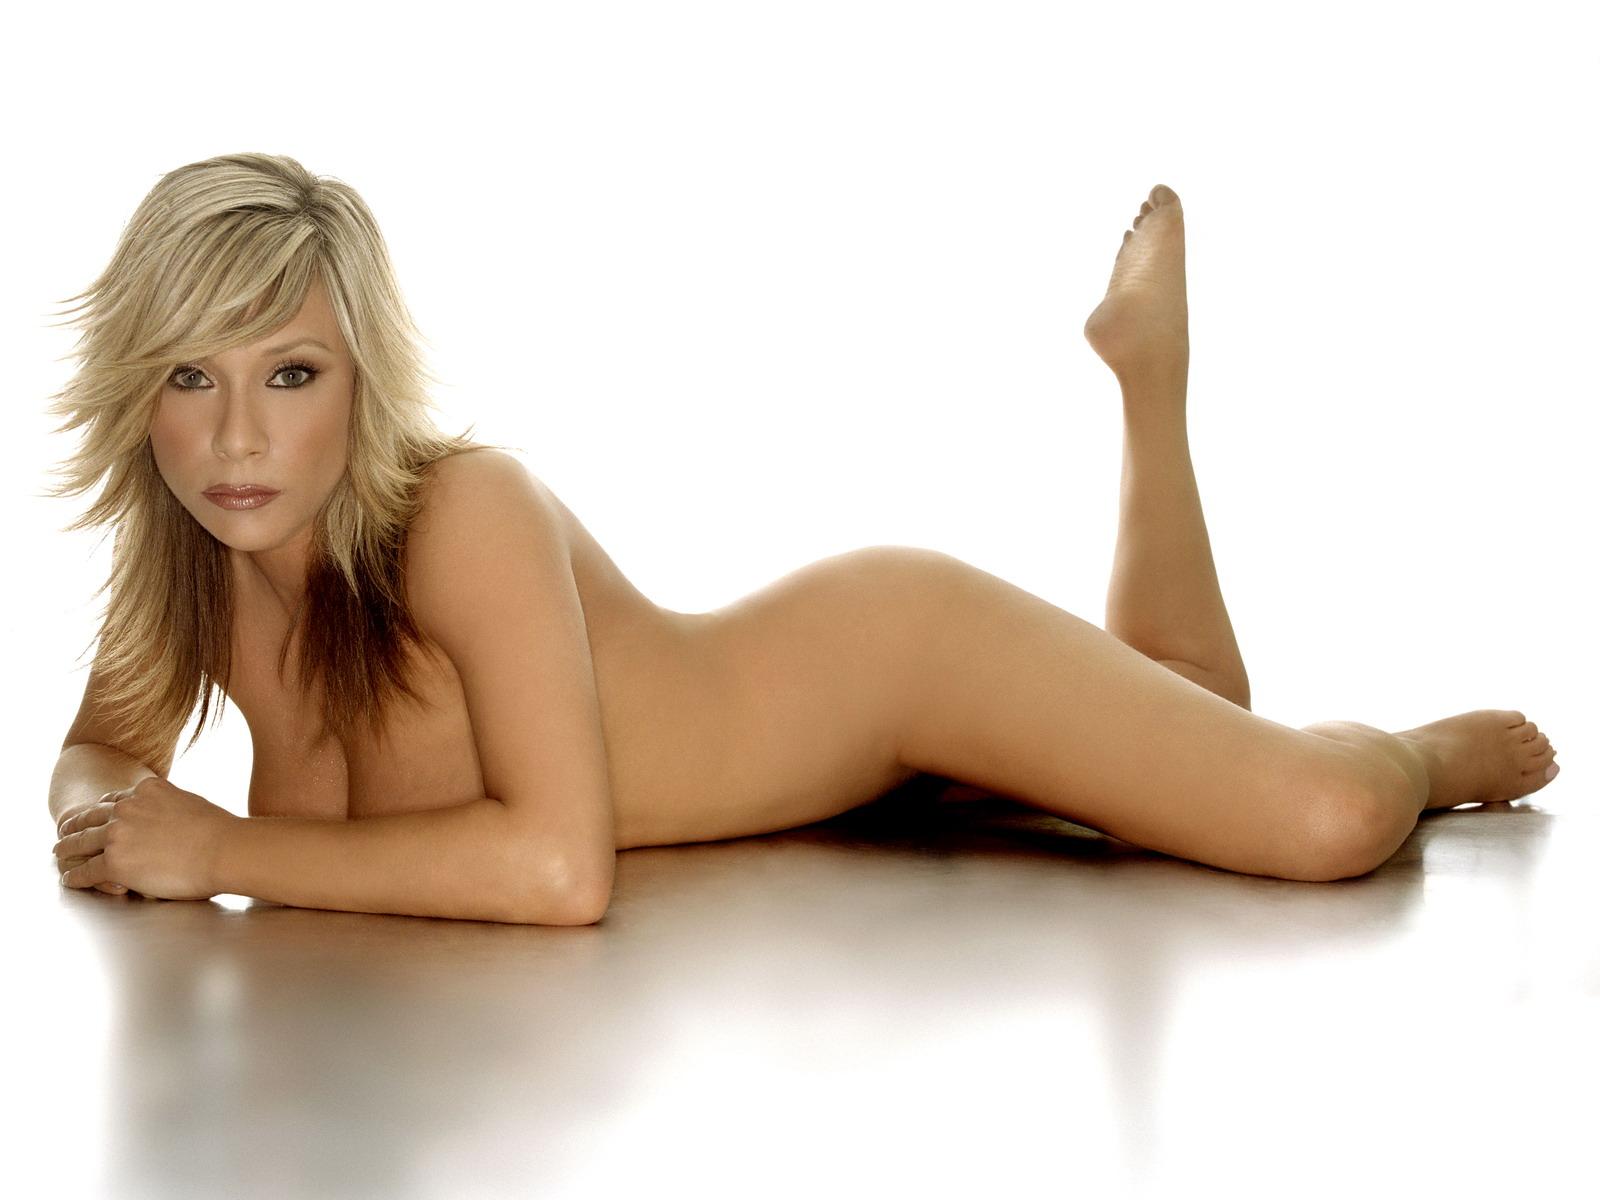 Samantha james desnuda fotos